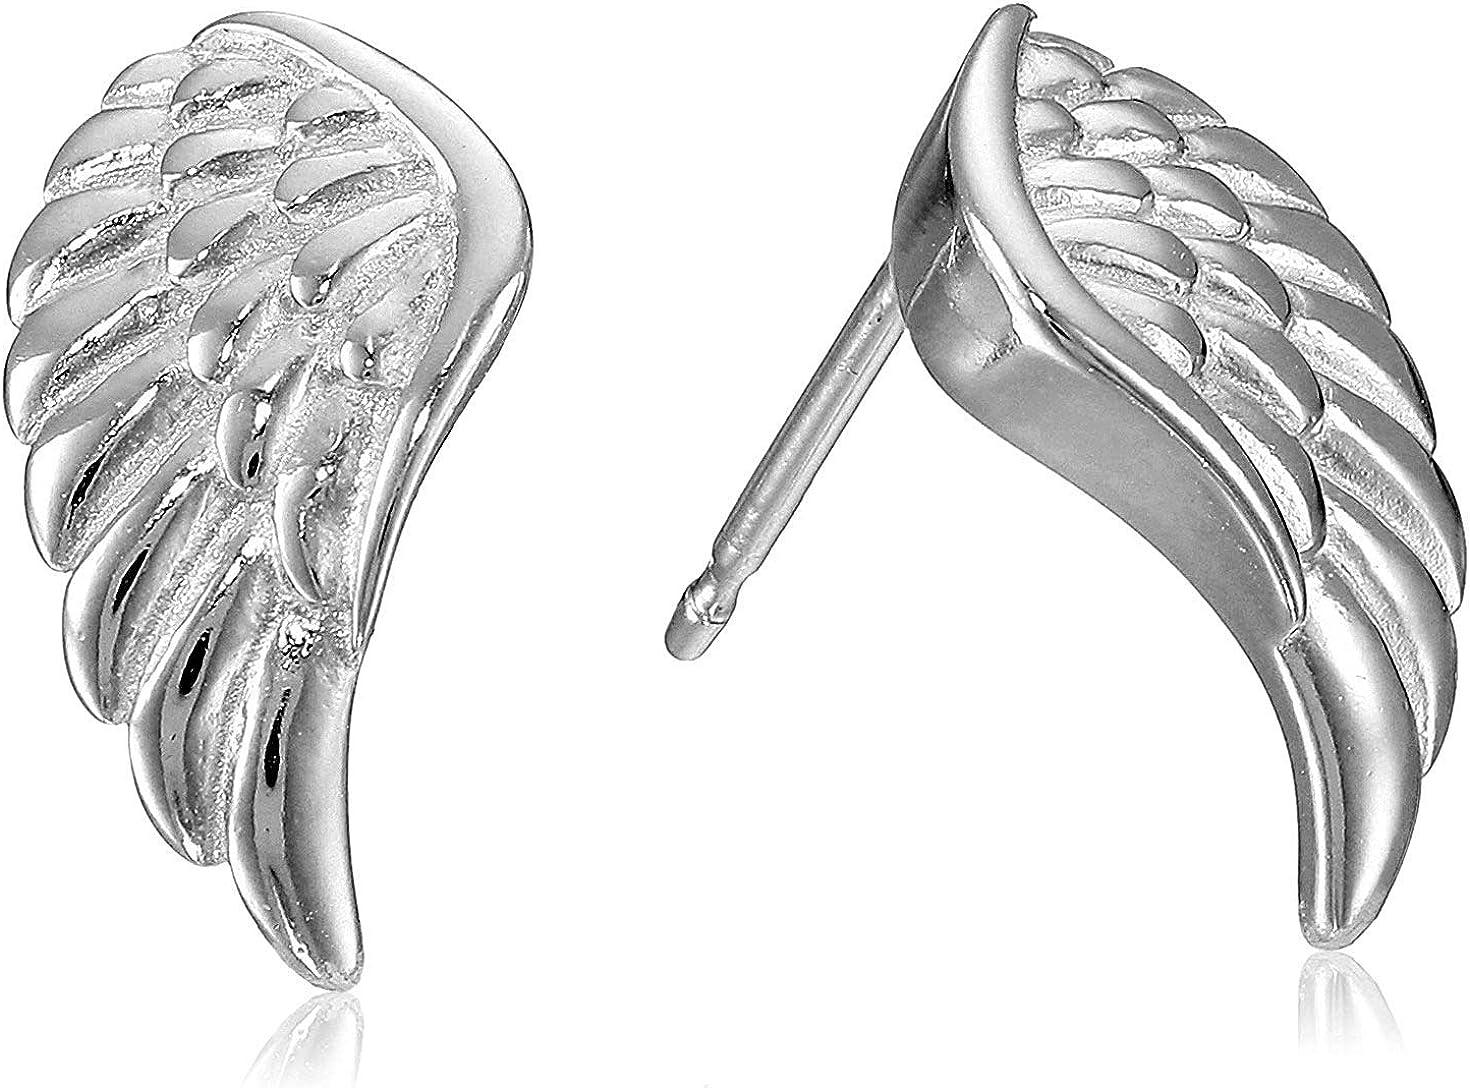 Plated 925 Sterling Silver Angel Wing Stud Earrings